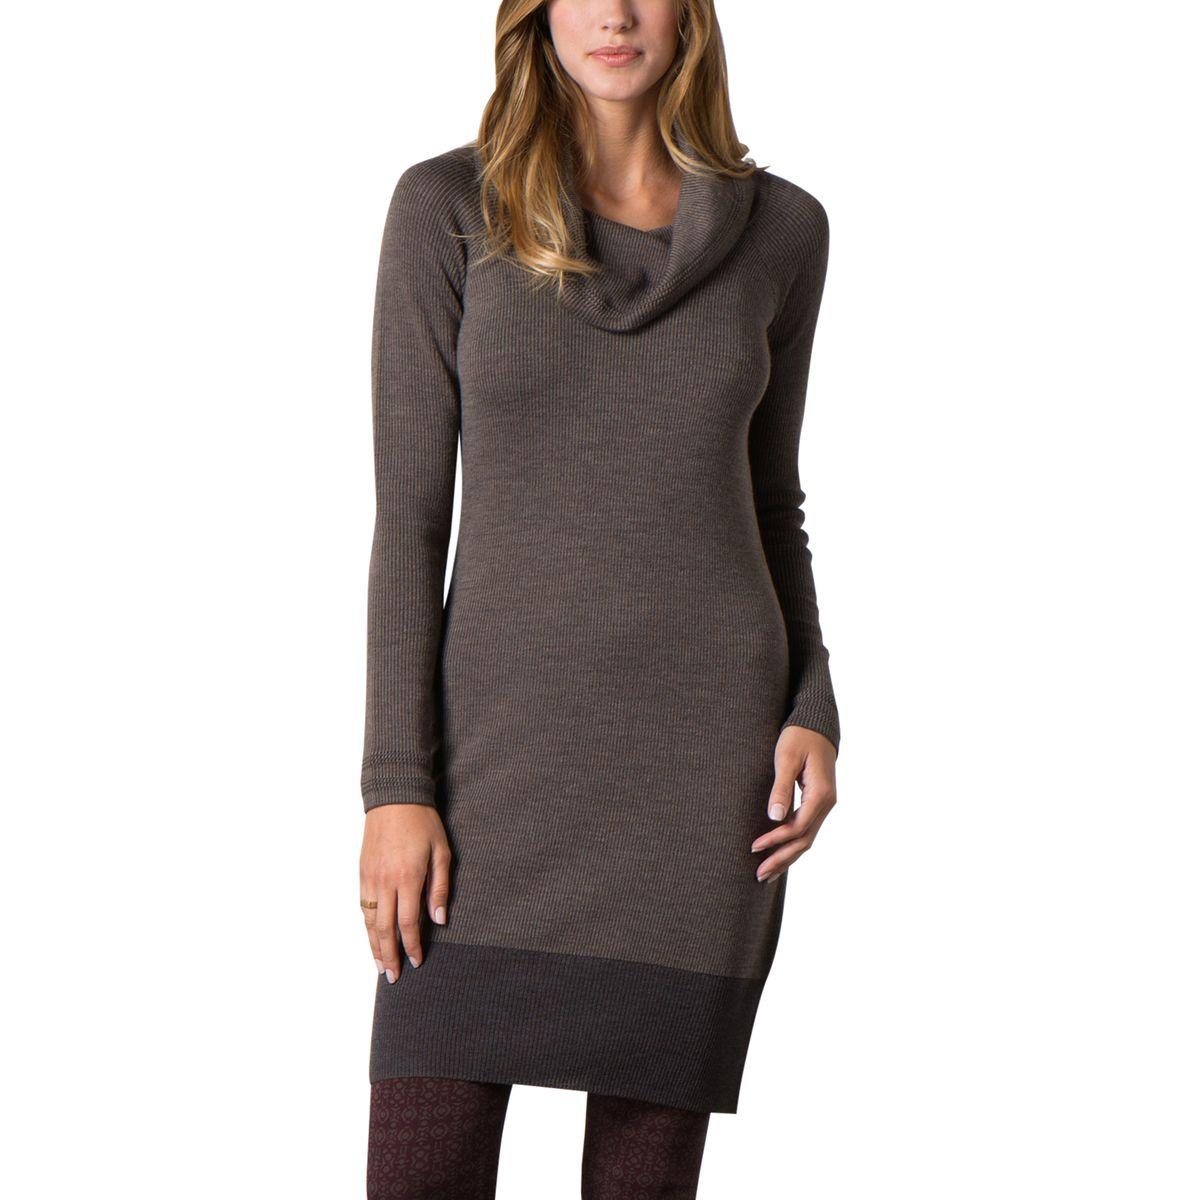 Toad&Co Uptown Sweater Dress - Women